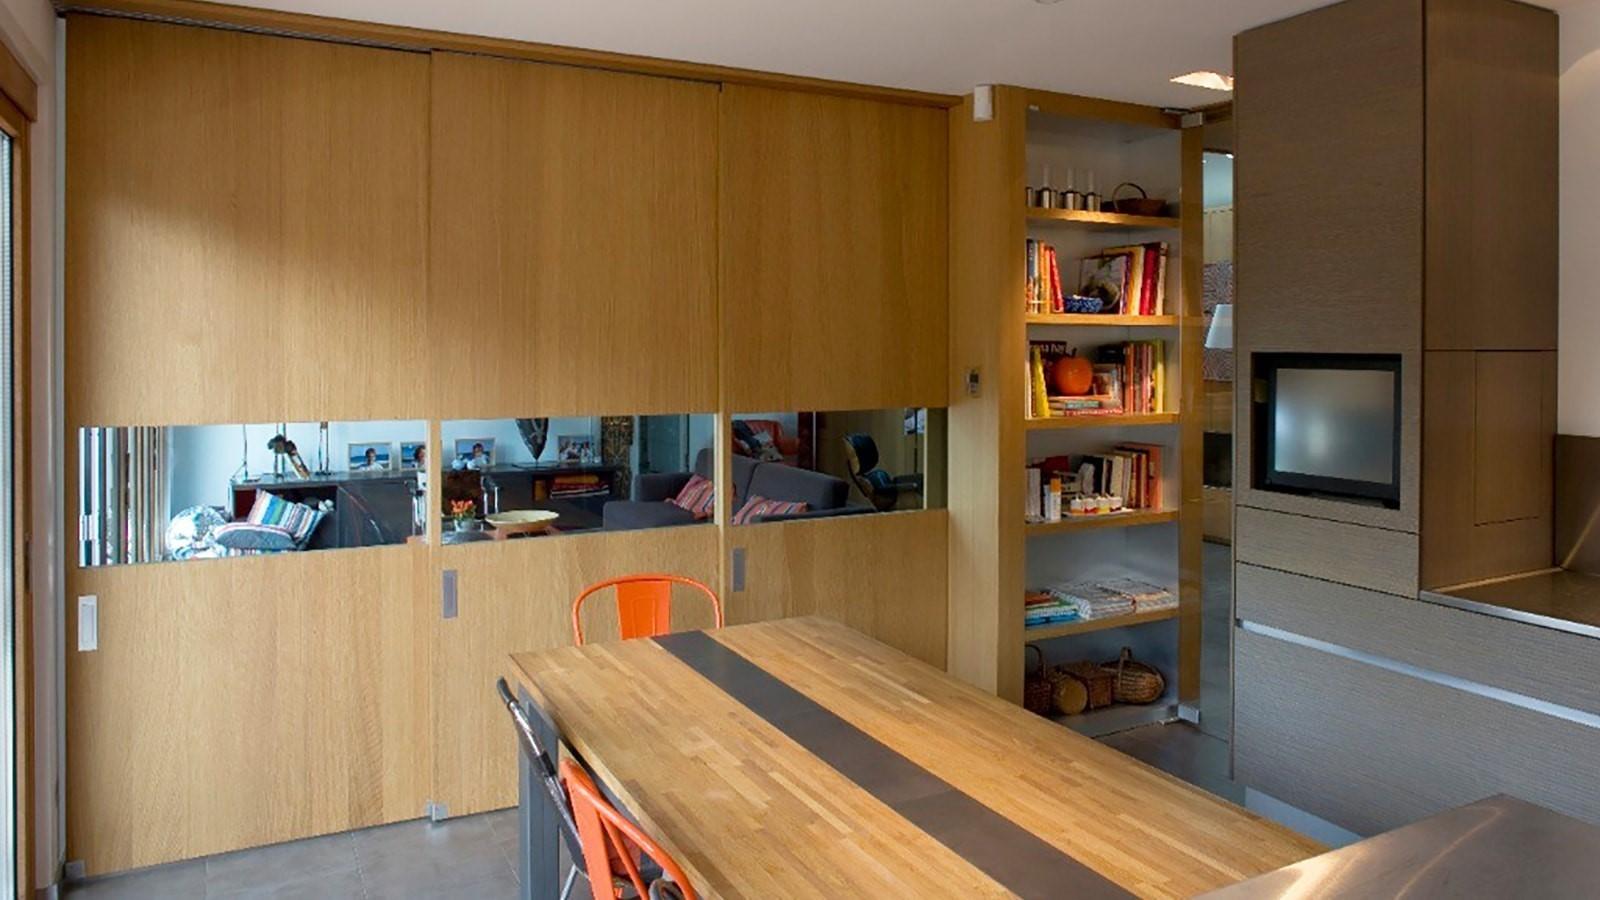 Cuisine Chambre Salon Nantes Efi Design (1)